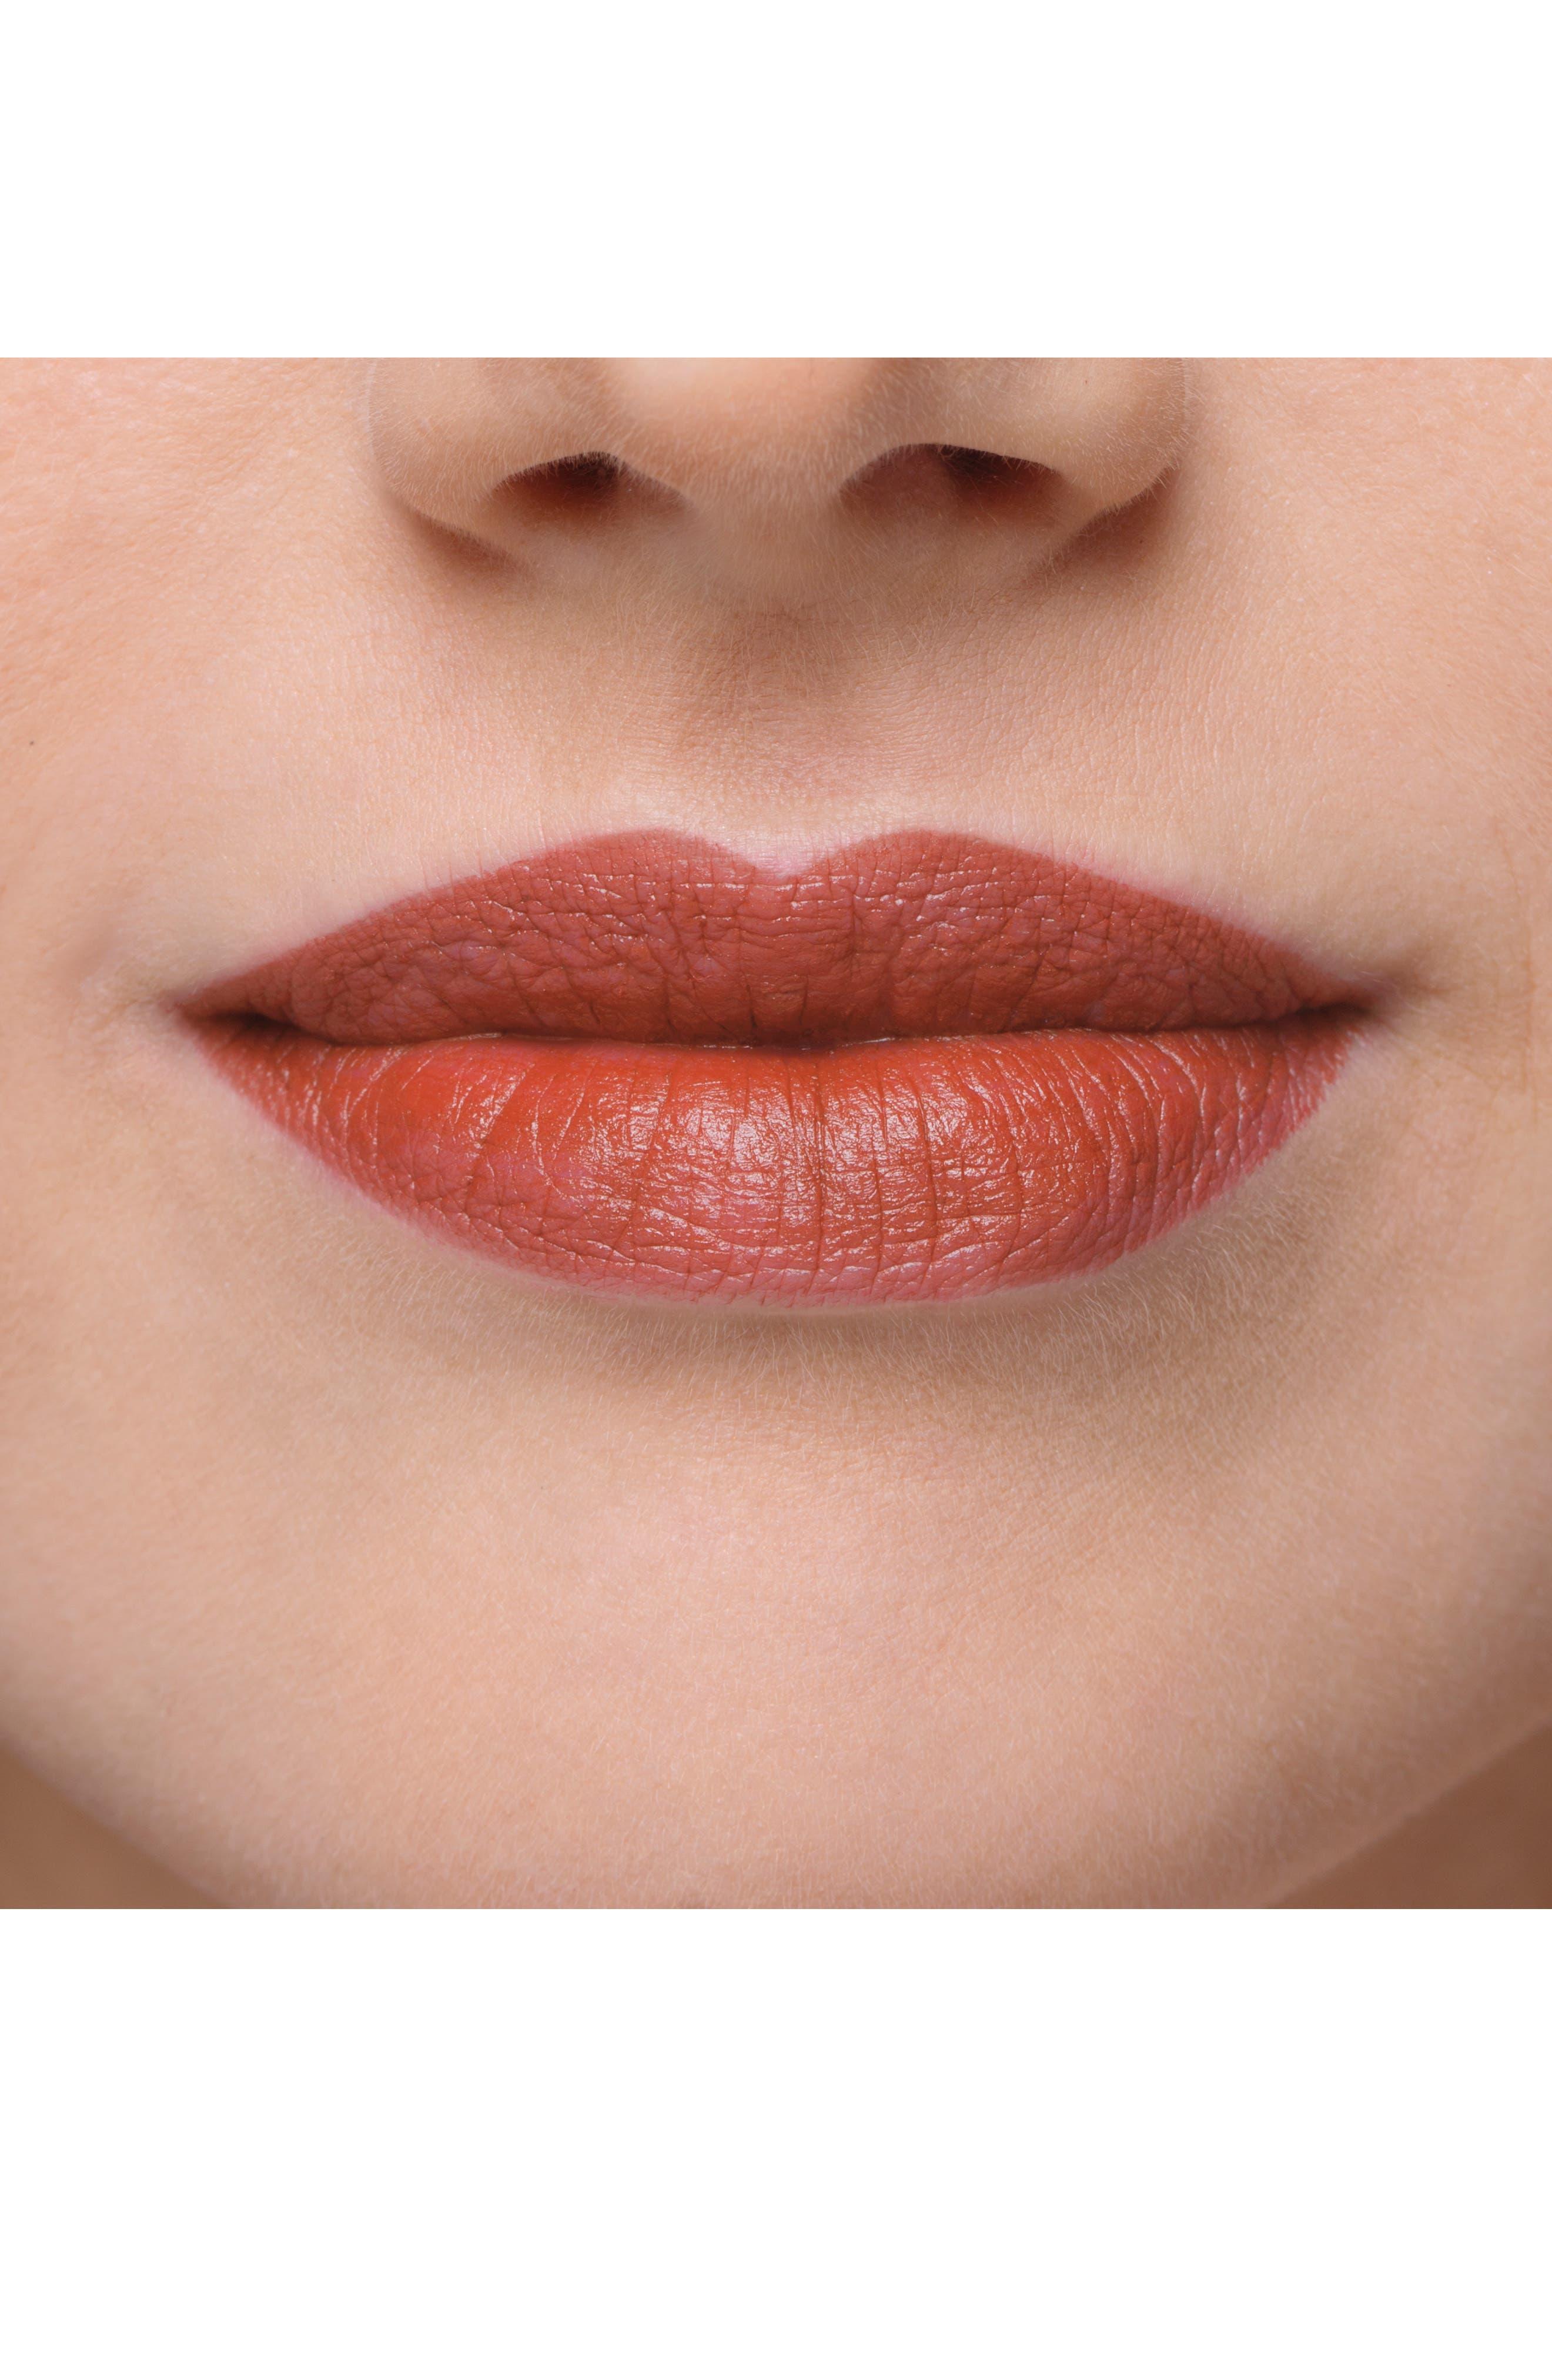 SISLEY PARIS,                             Le Phyto-Rouge Lipstick,                             Alternate thumbnail 2, color,                             12 - BEIGE BALI